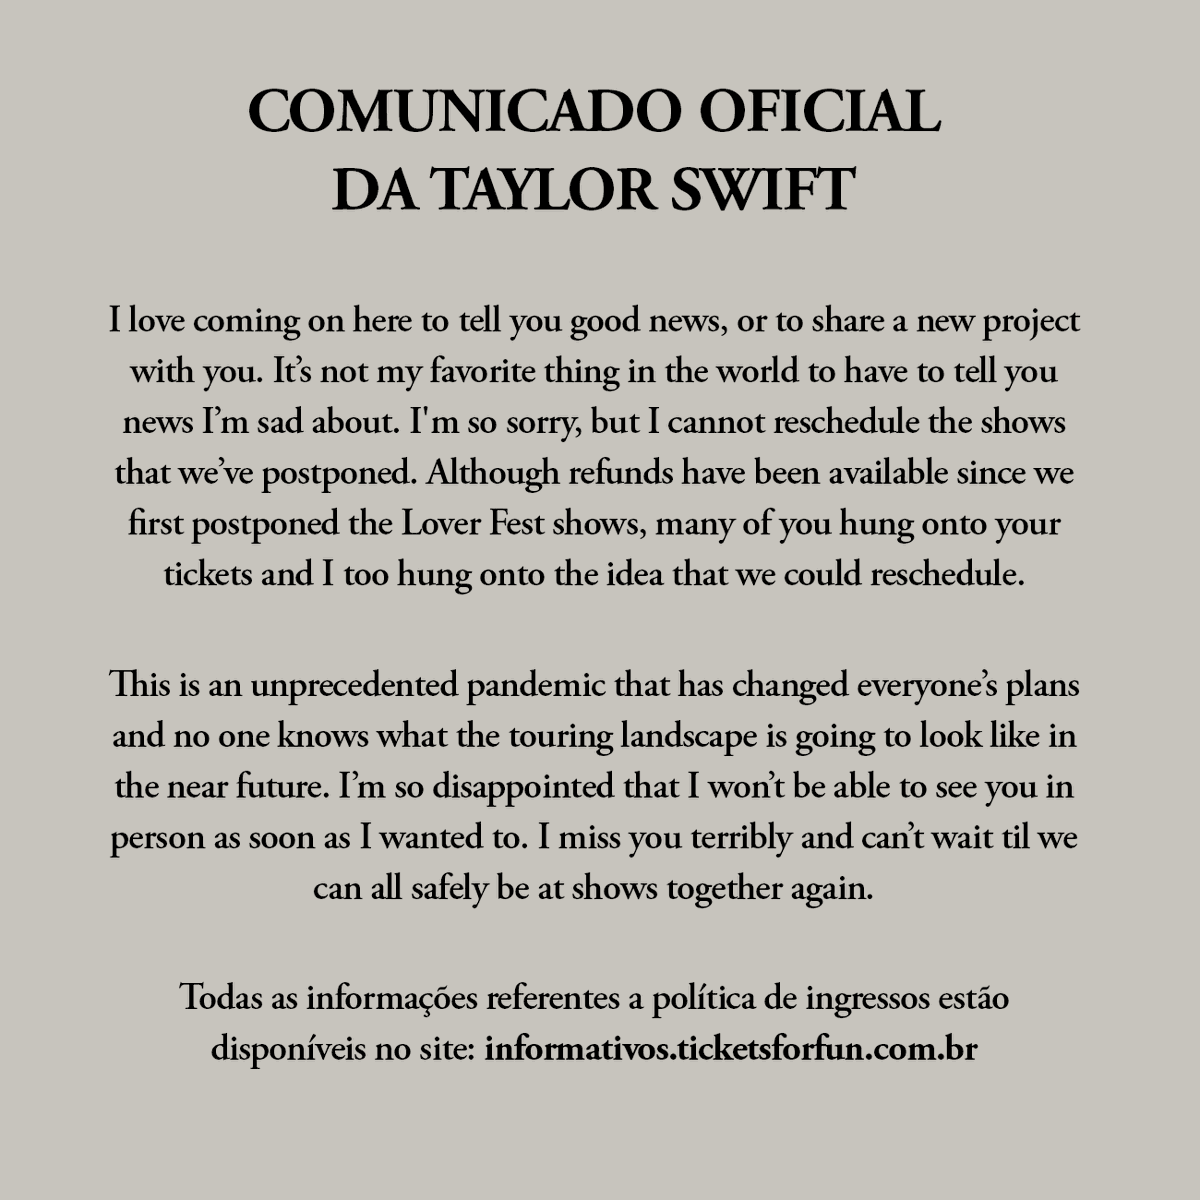 Comunicado oficial da Taylor Swift no Brasil: